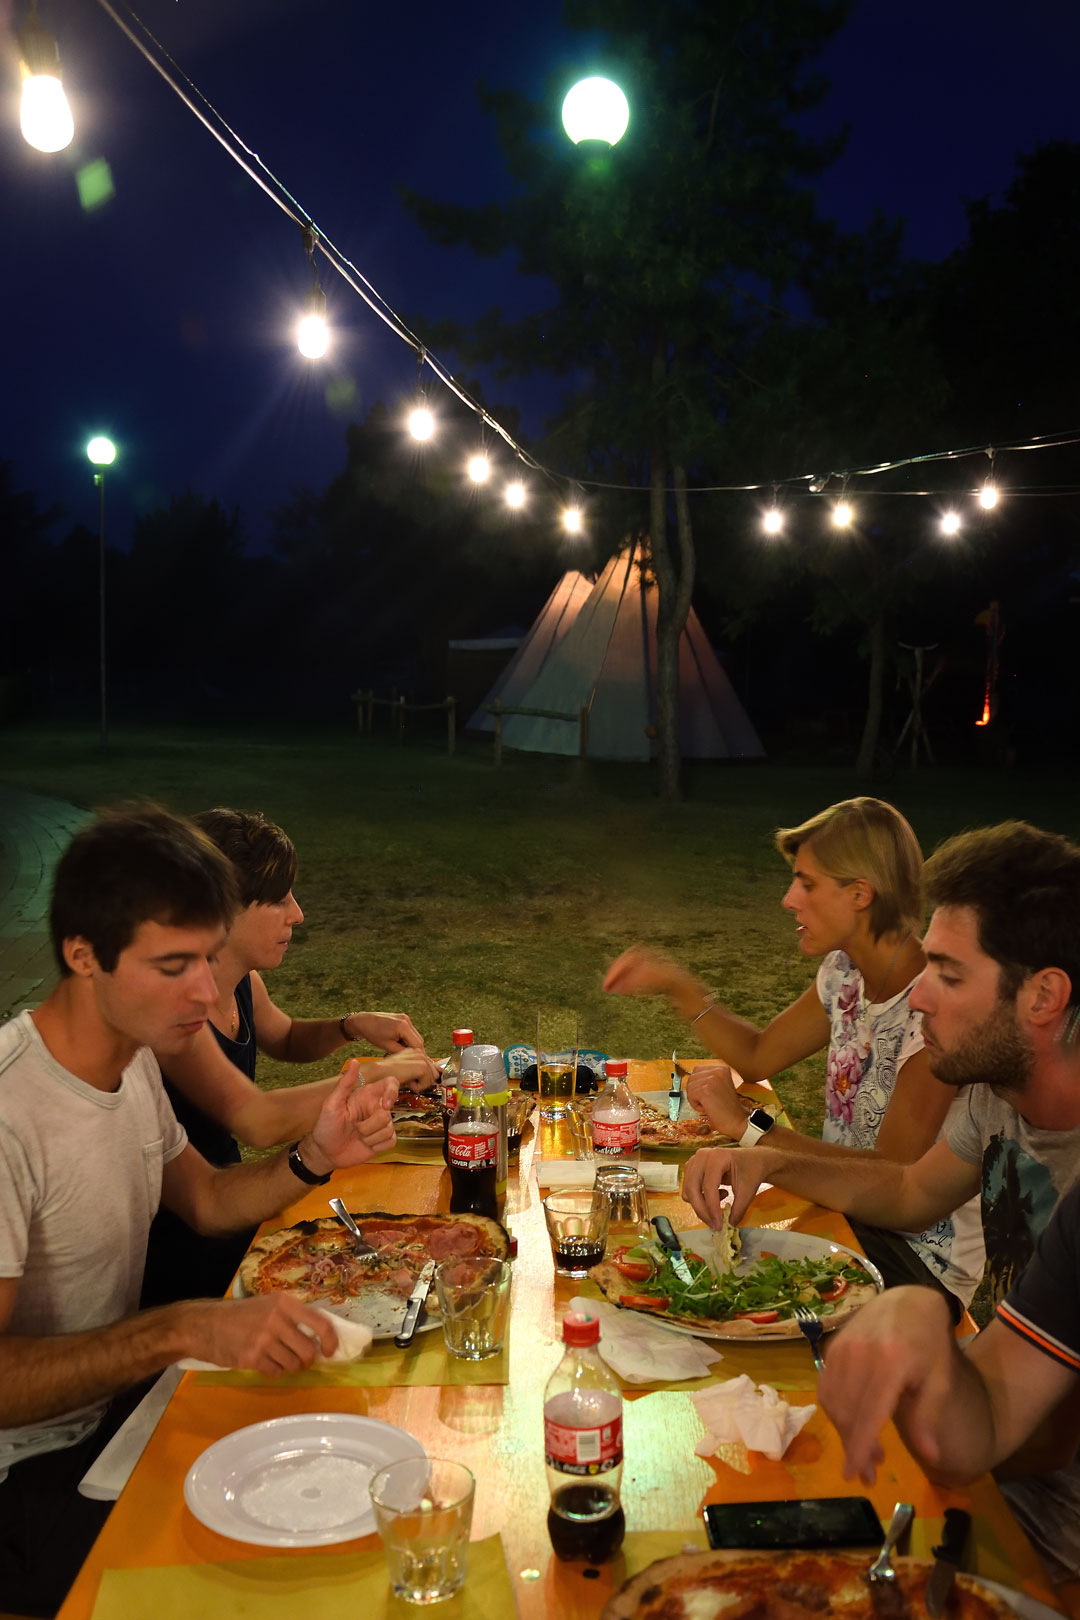 Mangiare all'aperto a Borgo San Lorenzo